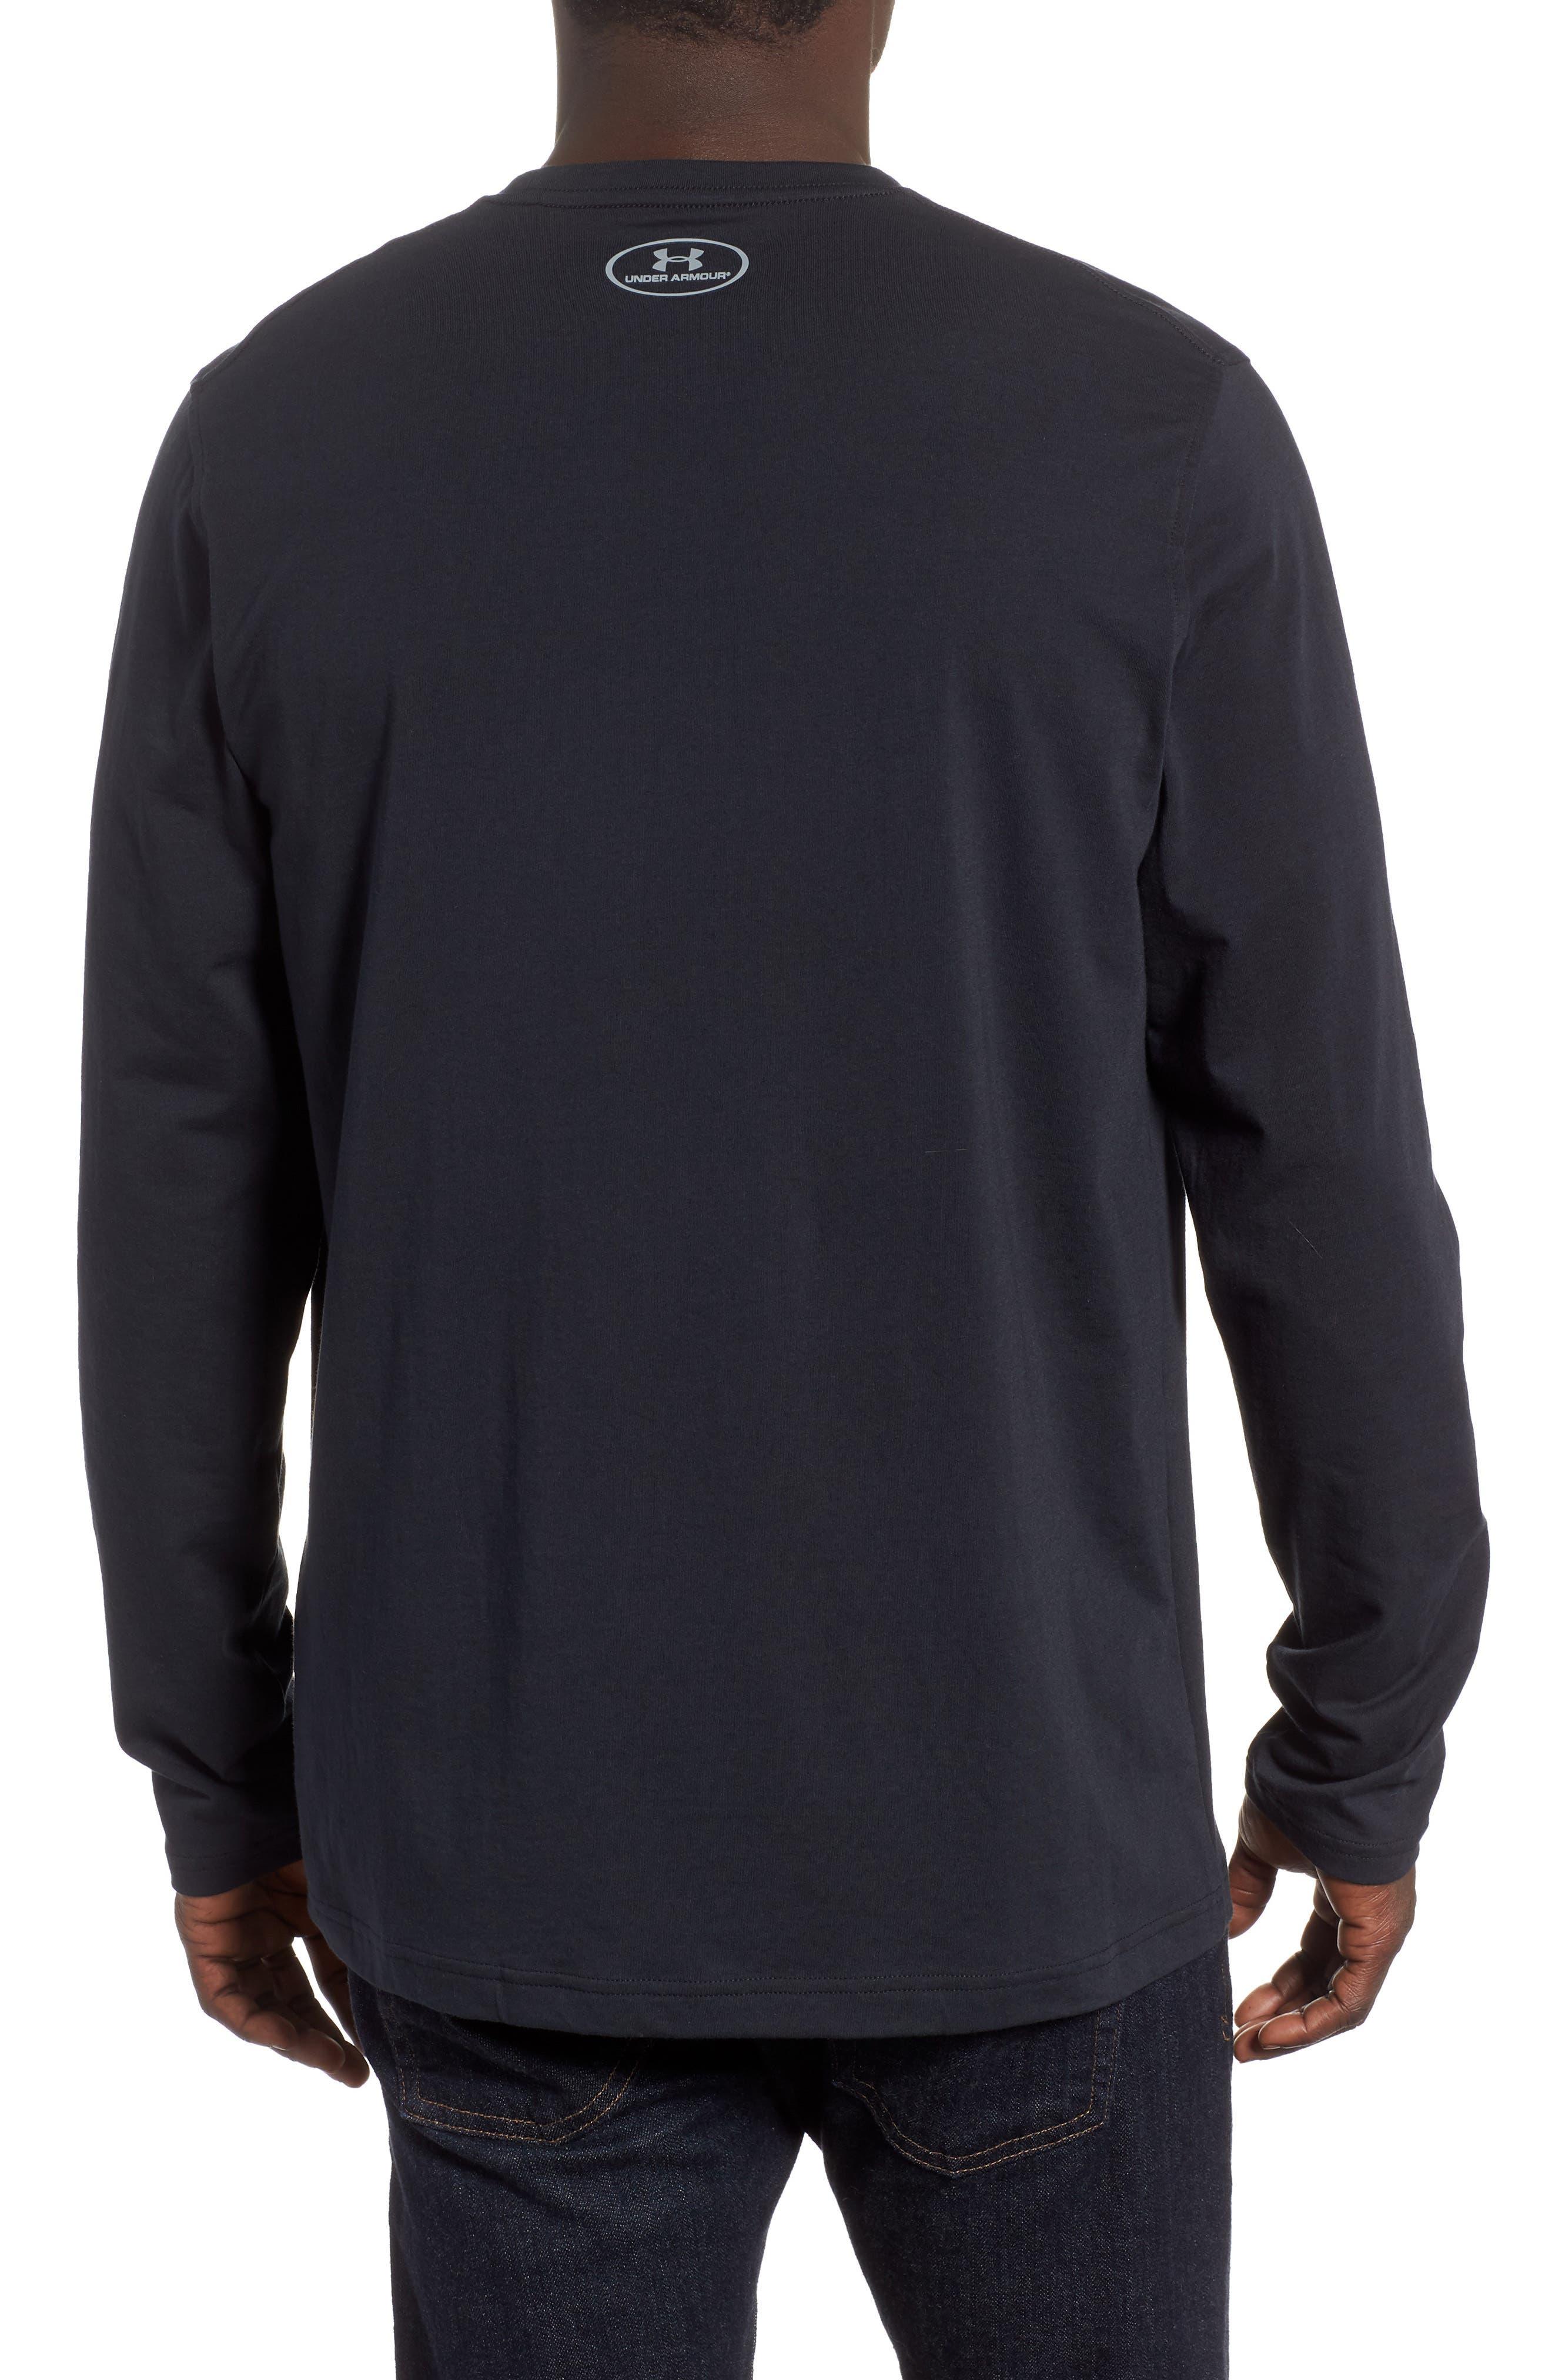 HeatGear<sup>®</sup> Long Sleeve Performance T-Shirt,                             Alternate thumbnail 2, color,                             BLACK/ STEEL